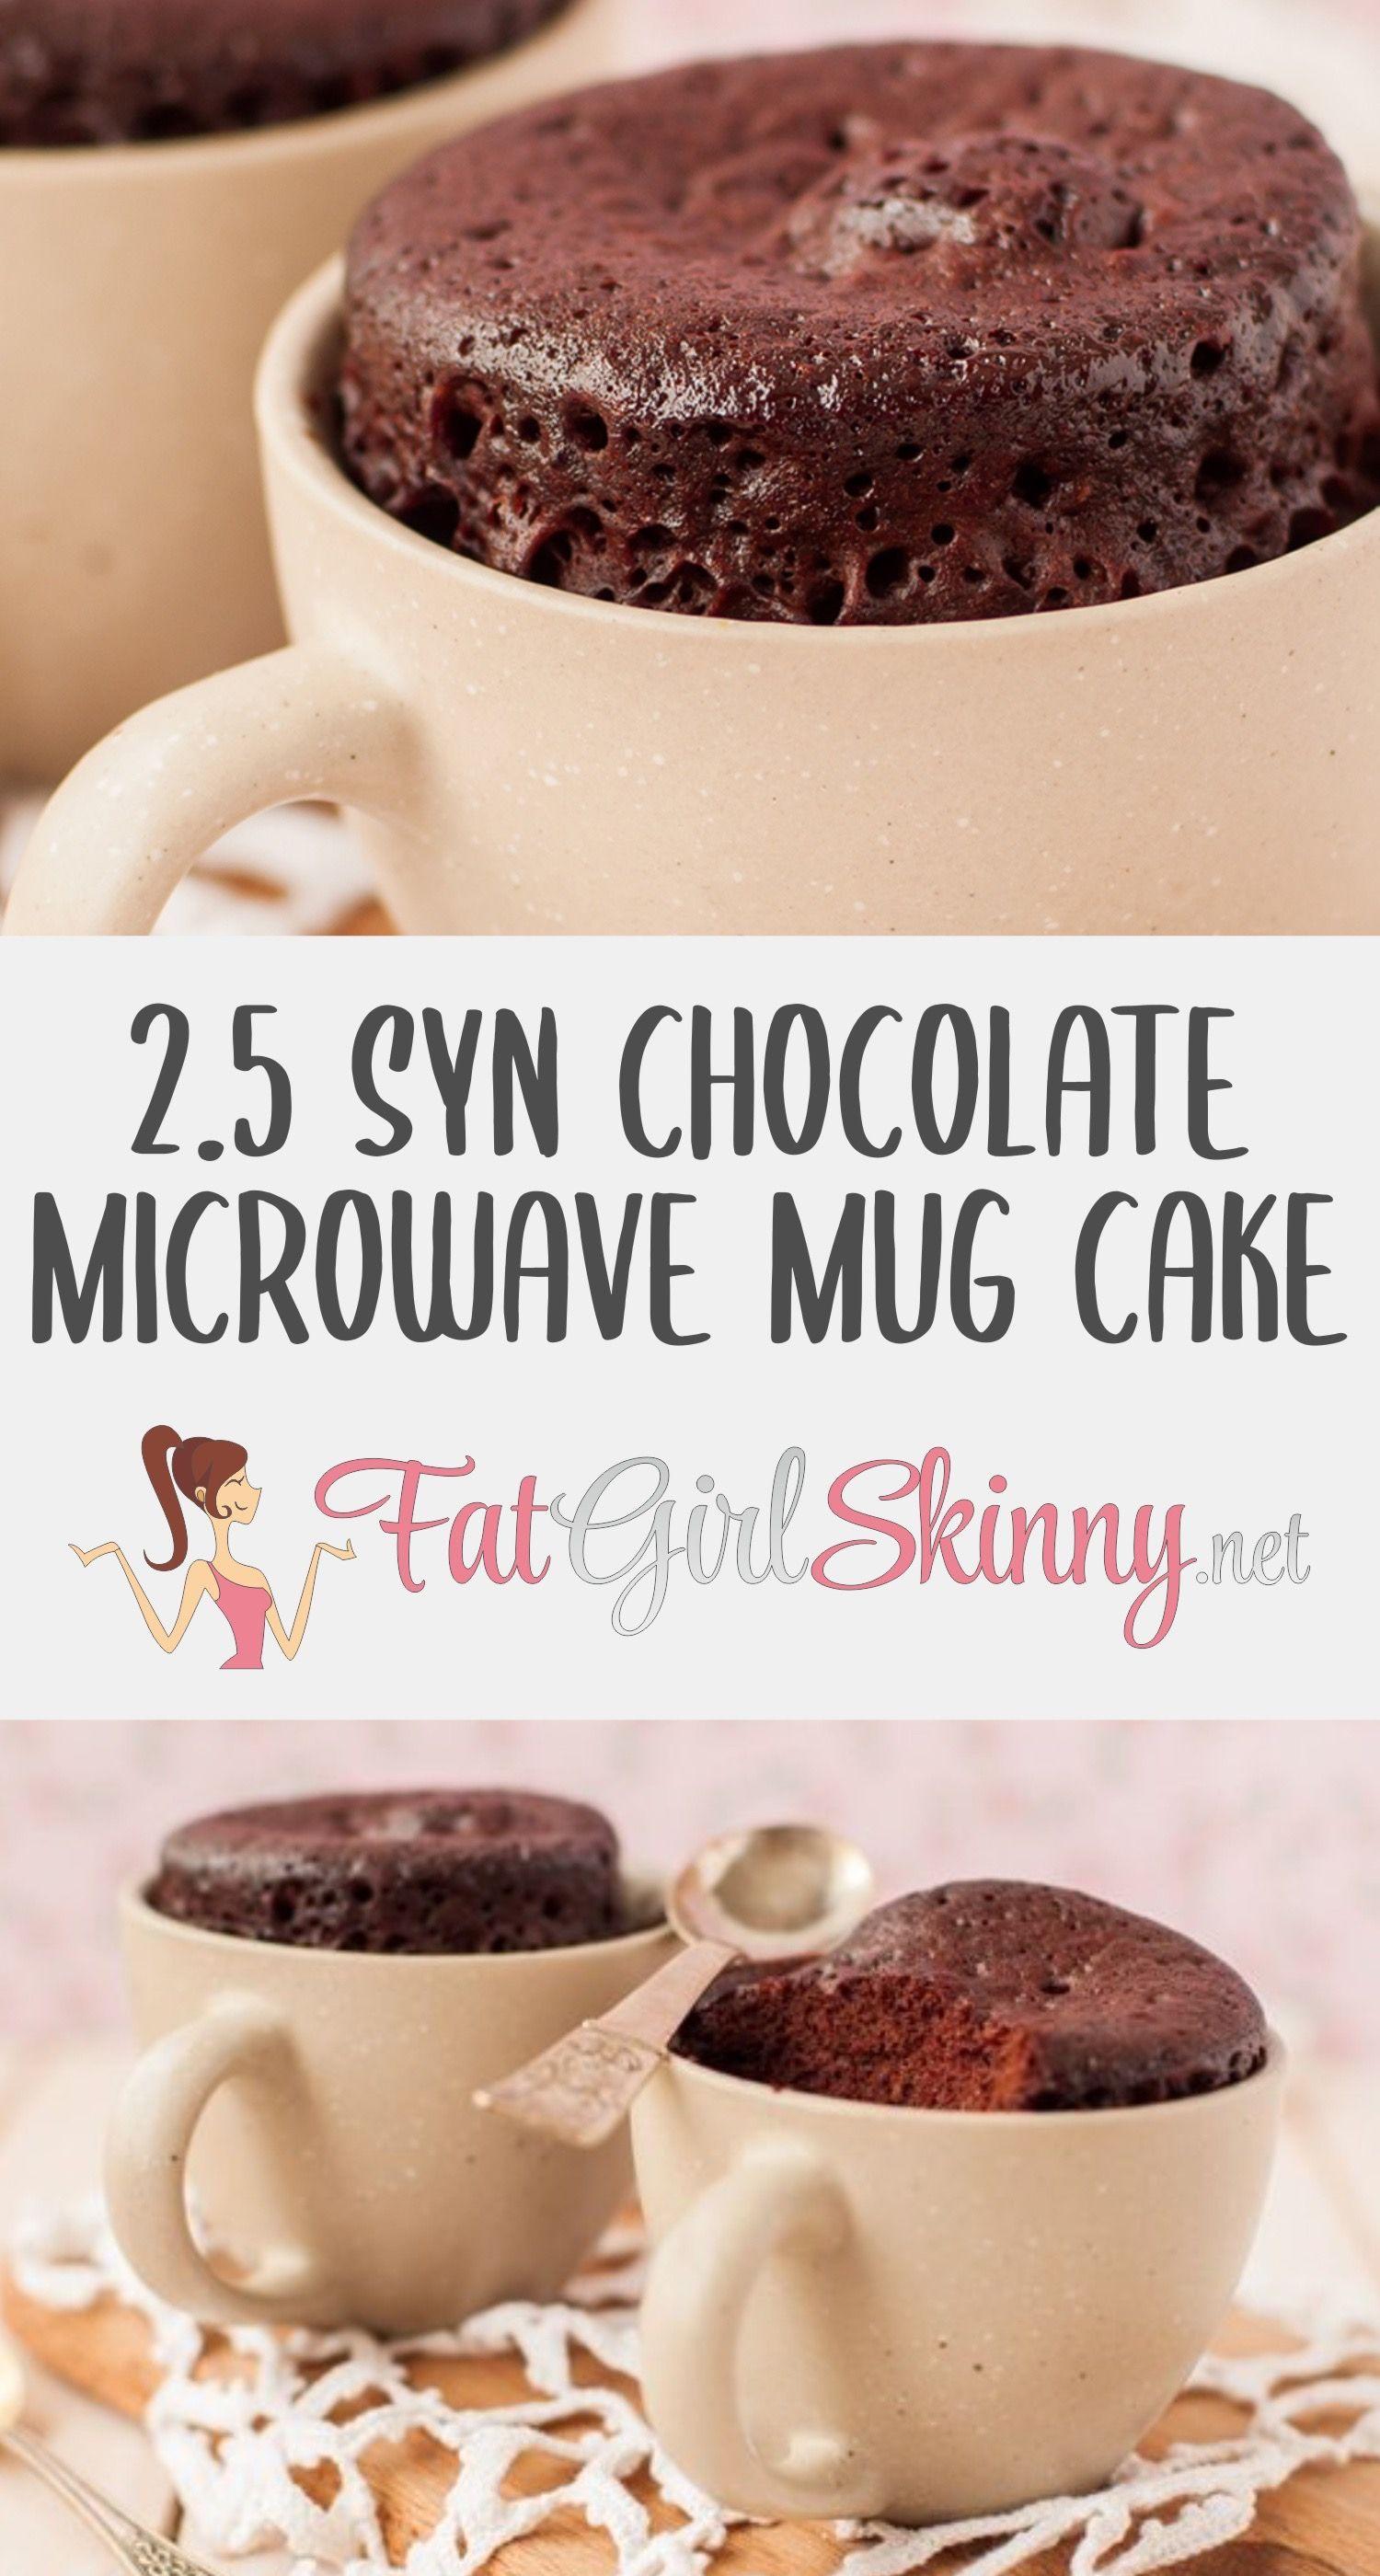 2.5 Syn Chocolate Microwave Mug Cake   Fatgirlskinny.net   Slimming World Recipes & More